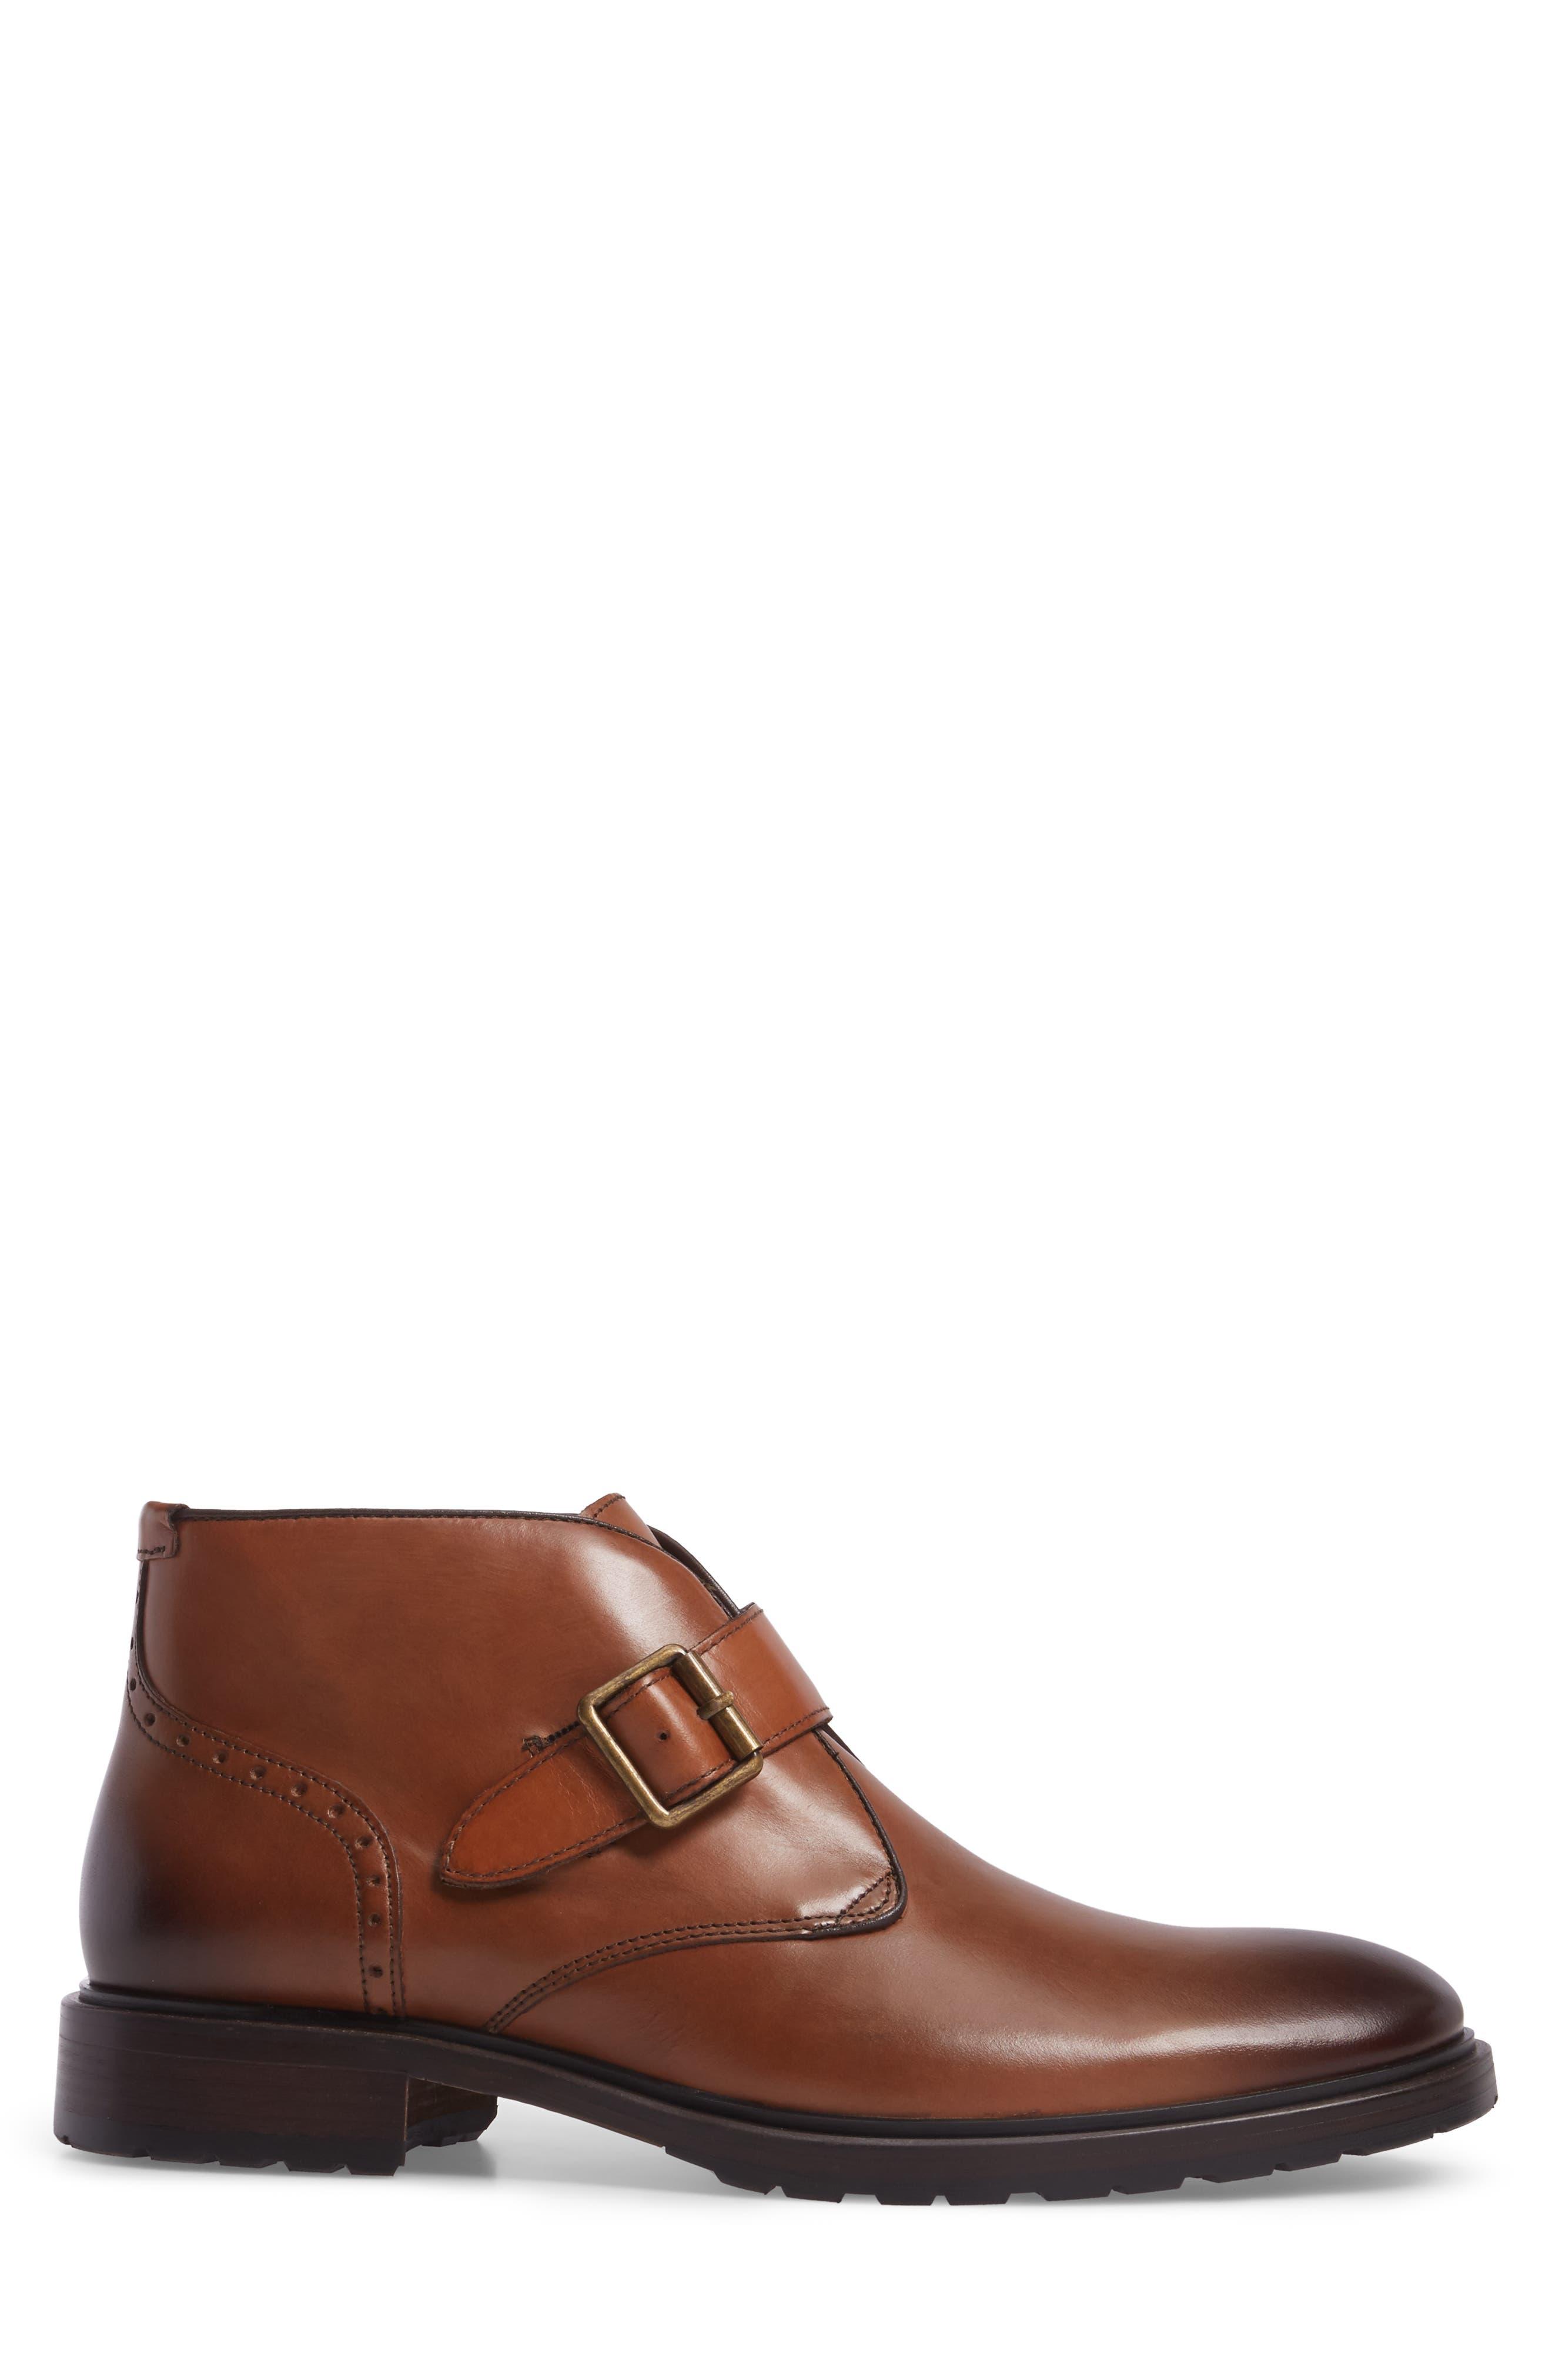 Alternate Image 3  - J&M 1850 Myles Monk Strap Boot (Men)